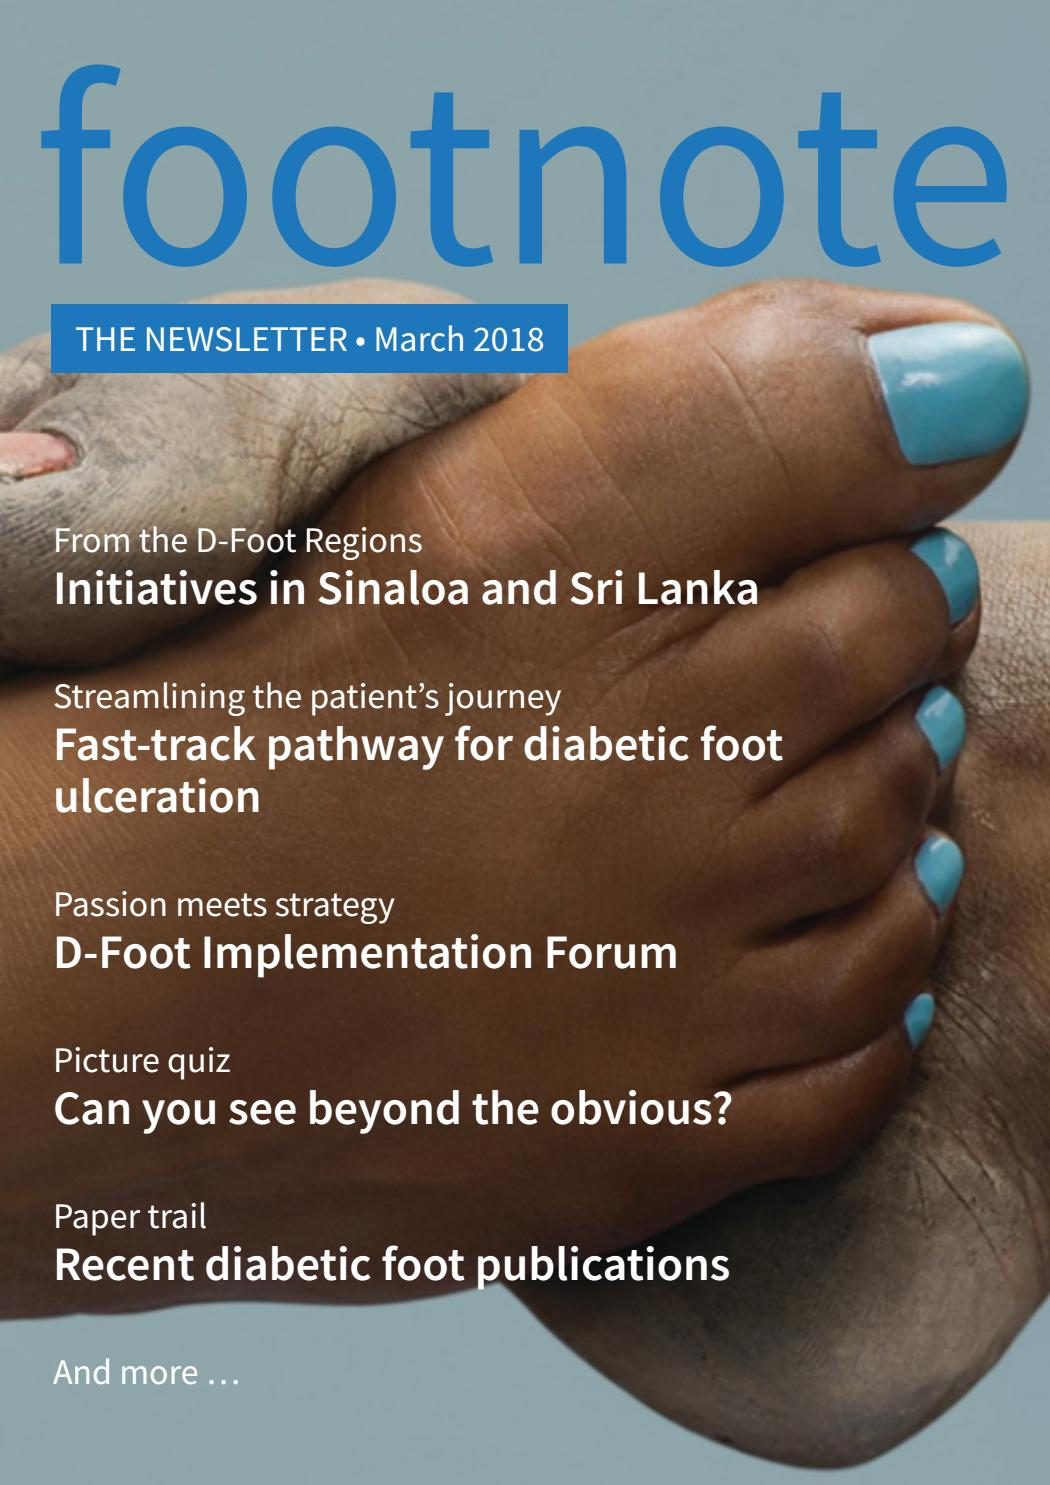 Simak artikel mengenai cara membuat footnote di word berikut. Footnote March 2018 by issuuluchendrickx - Issuu